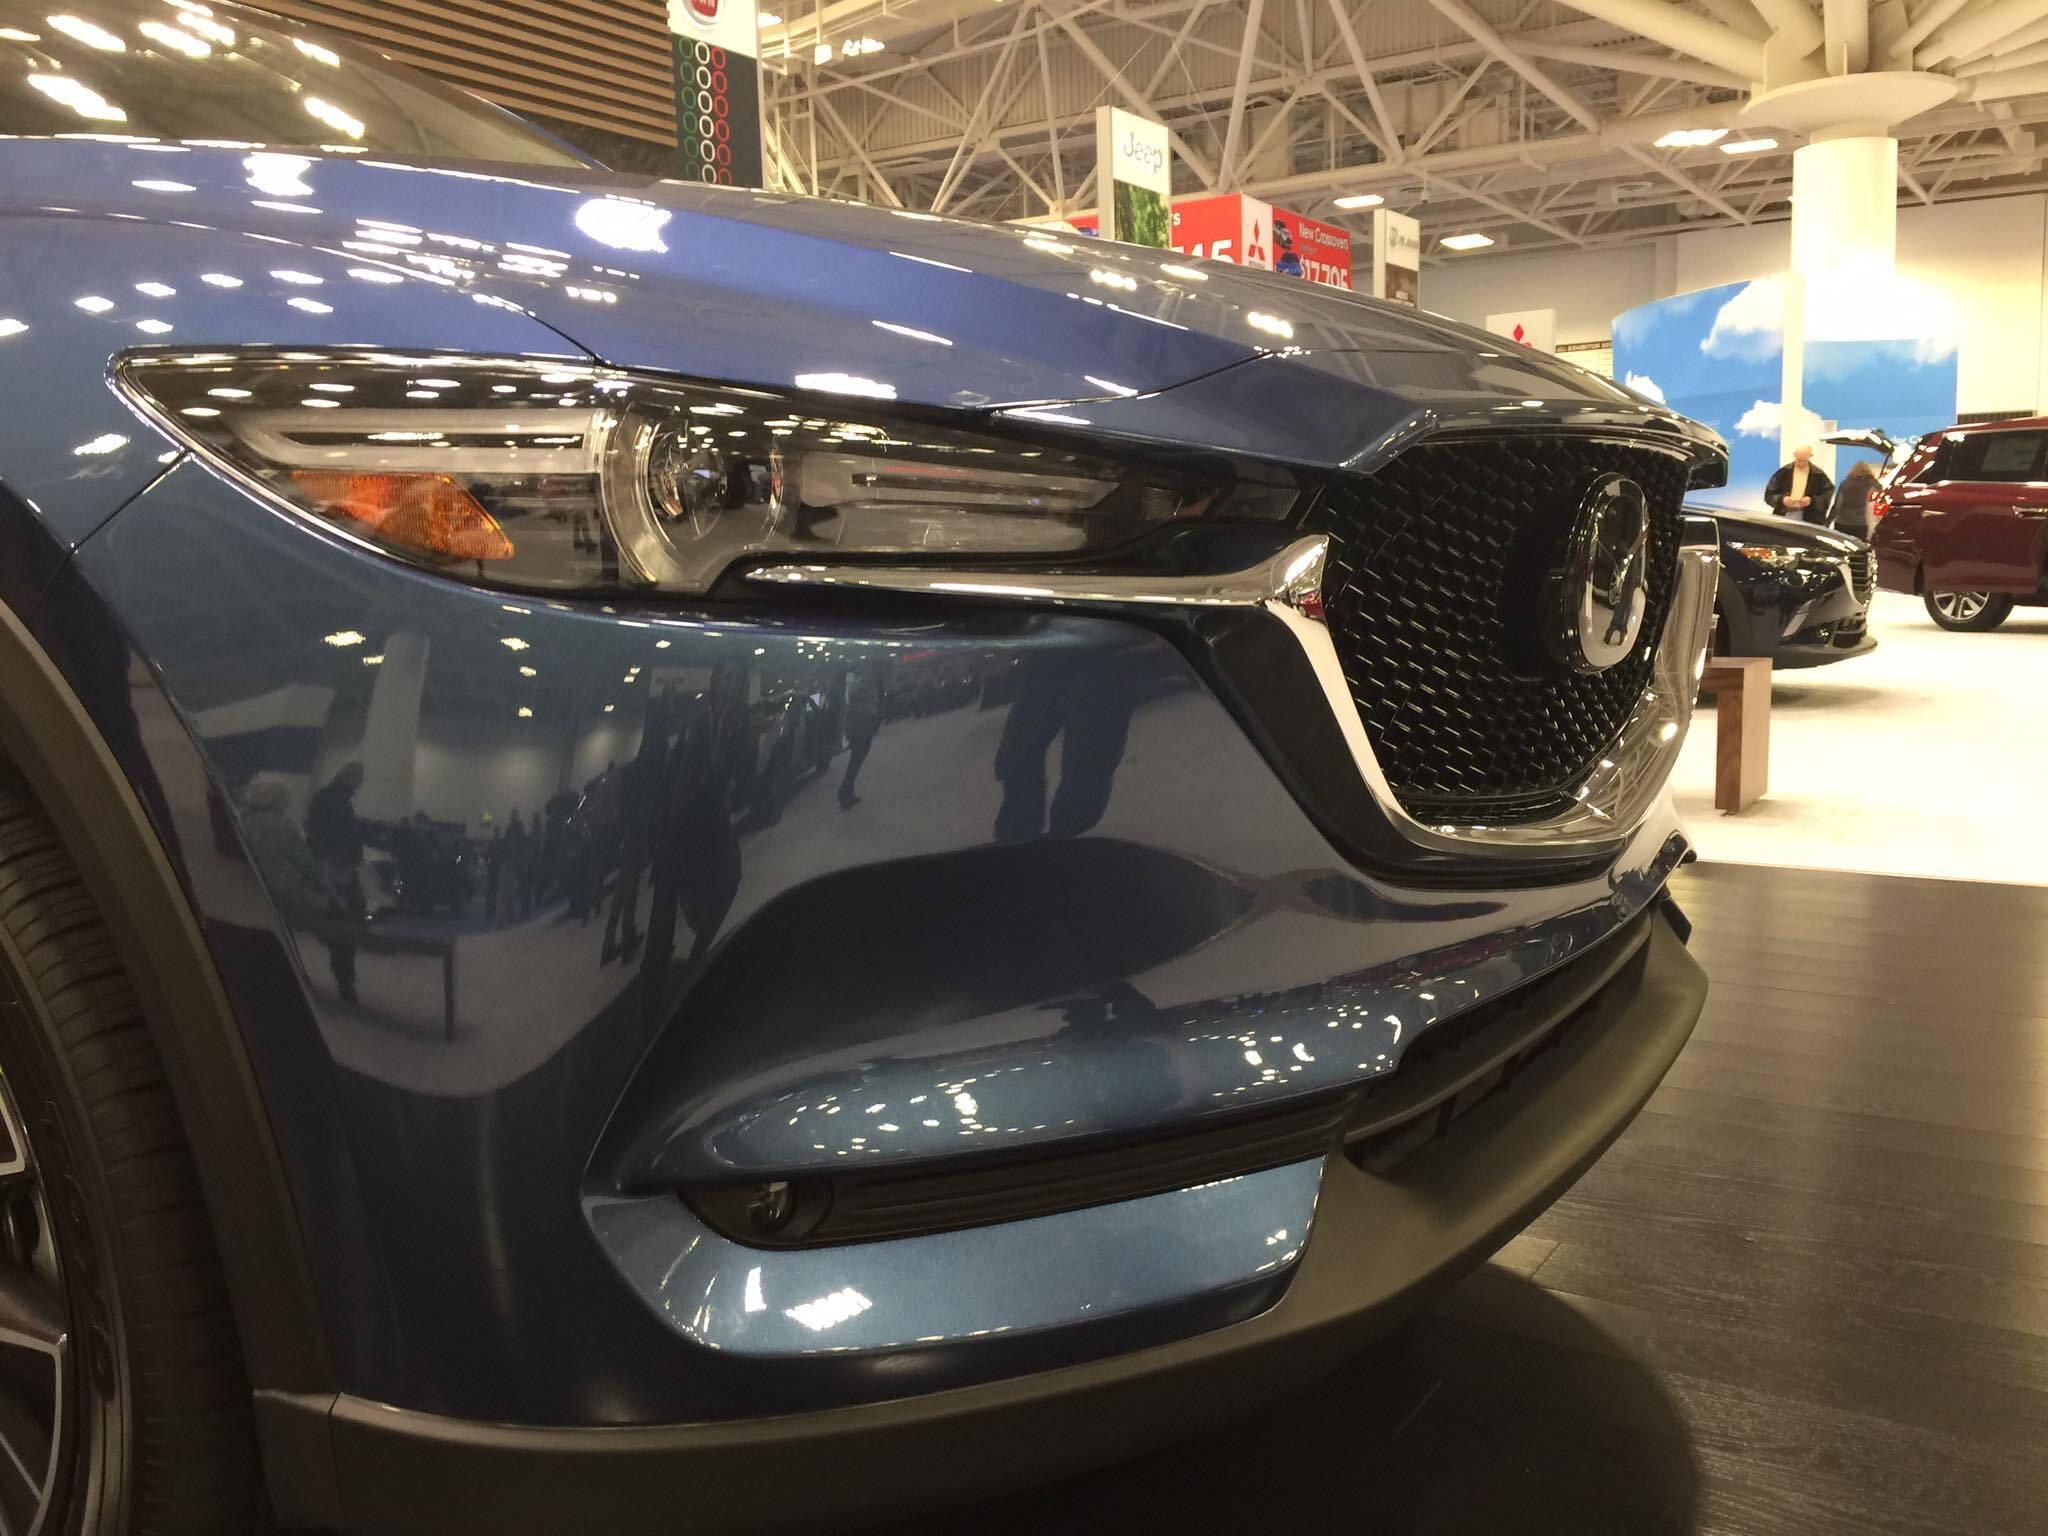 2017 Mazda CX 5 Redesign